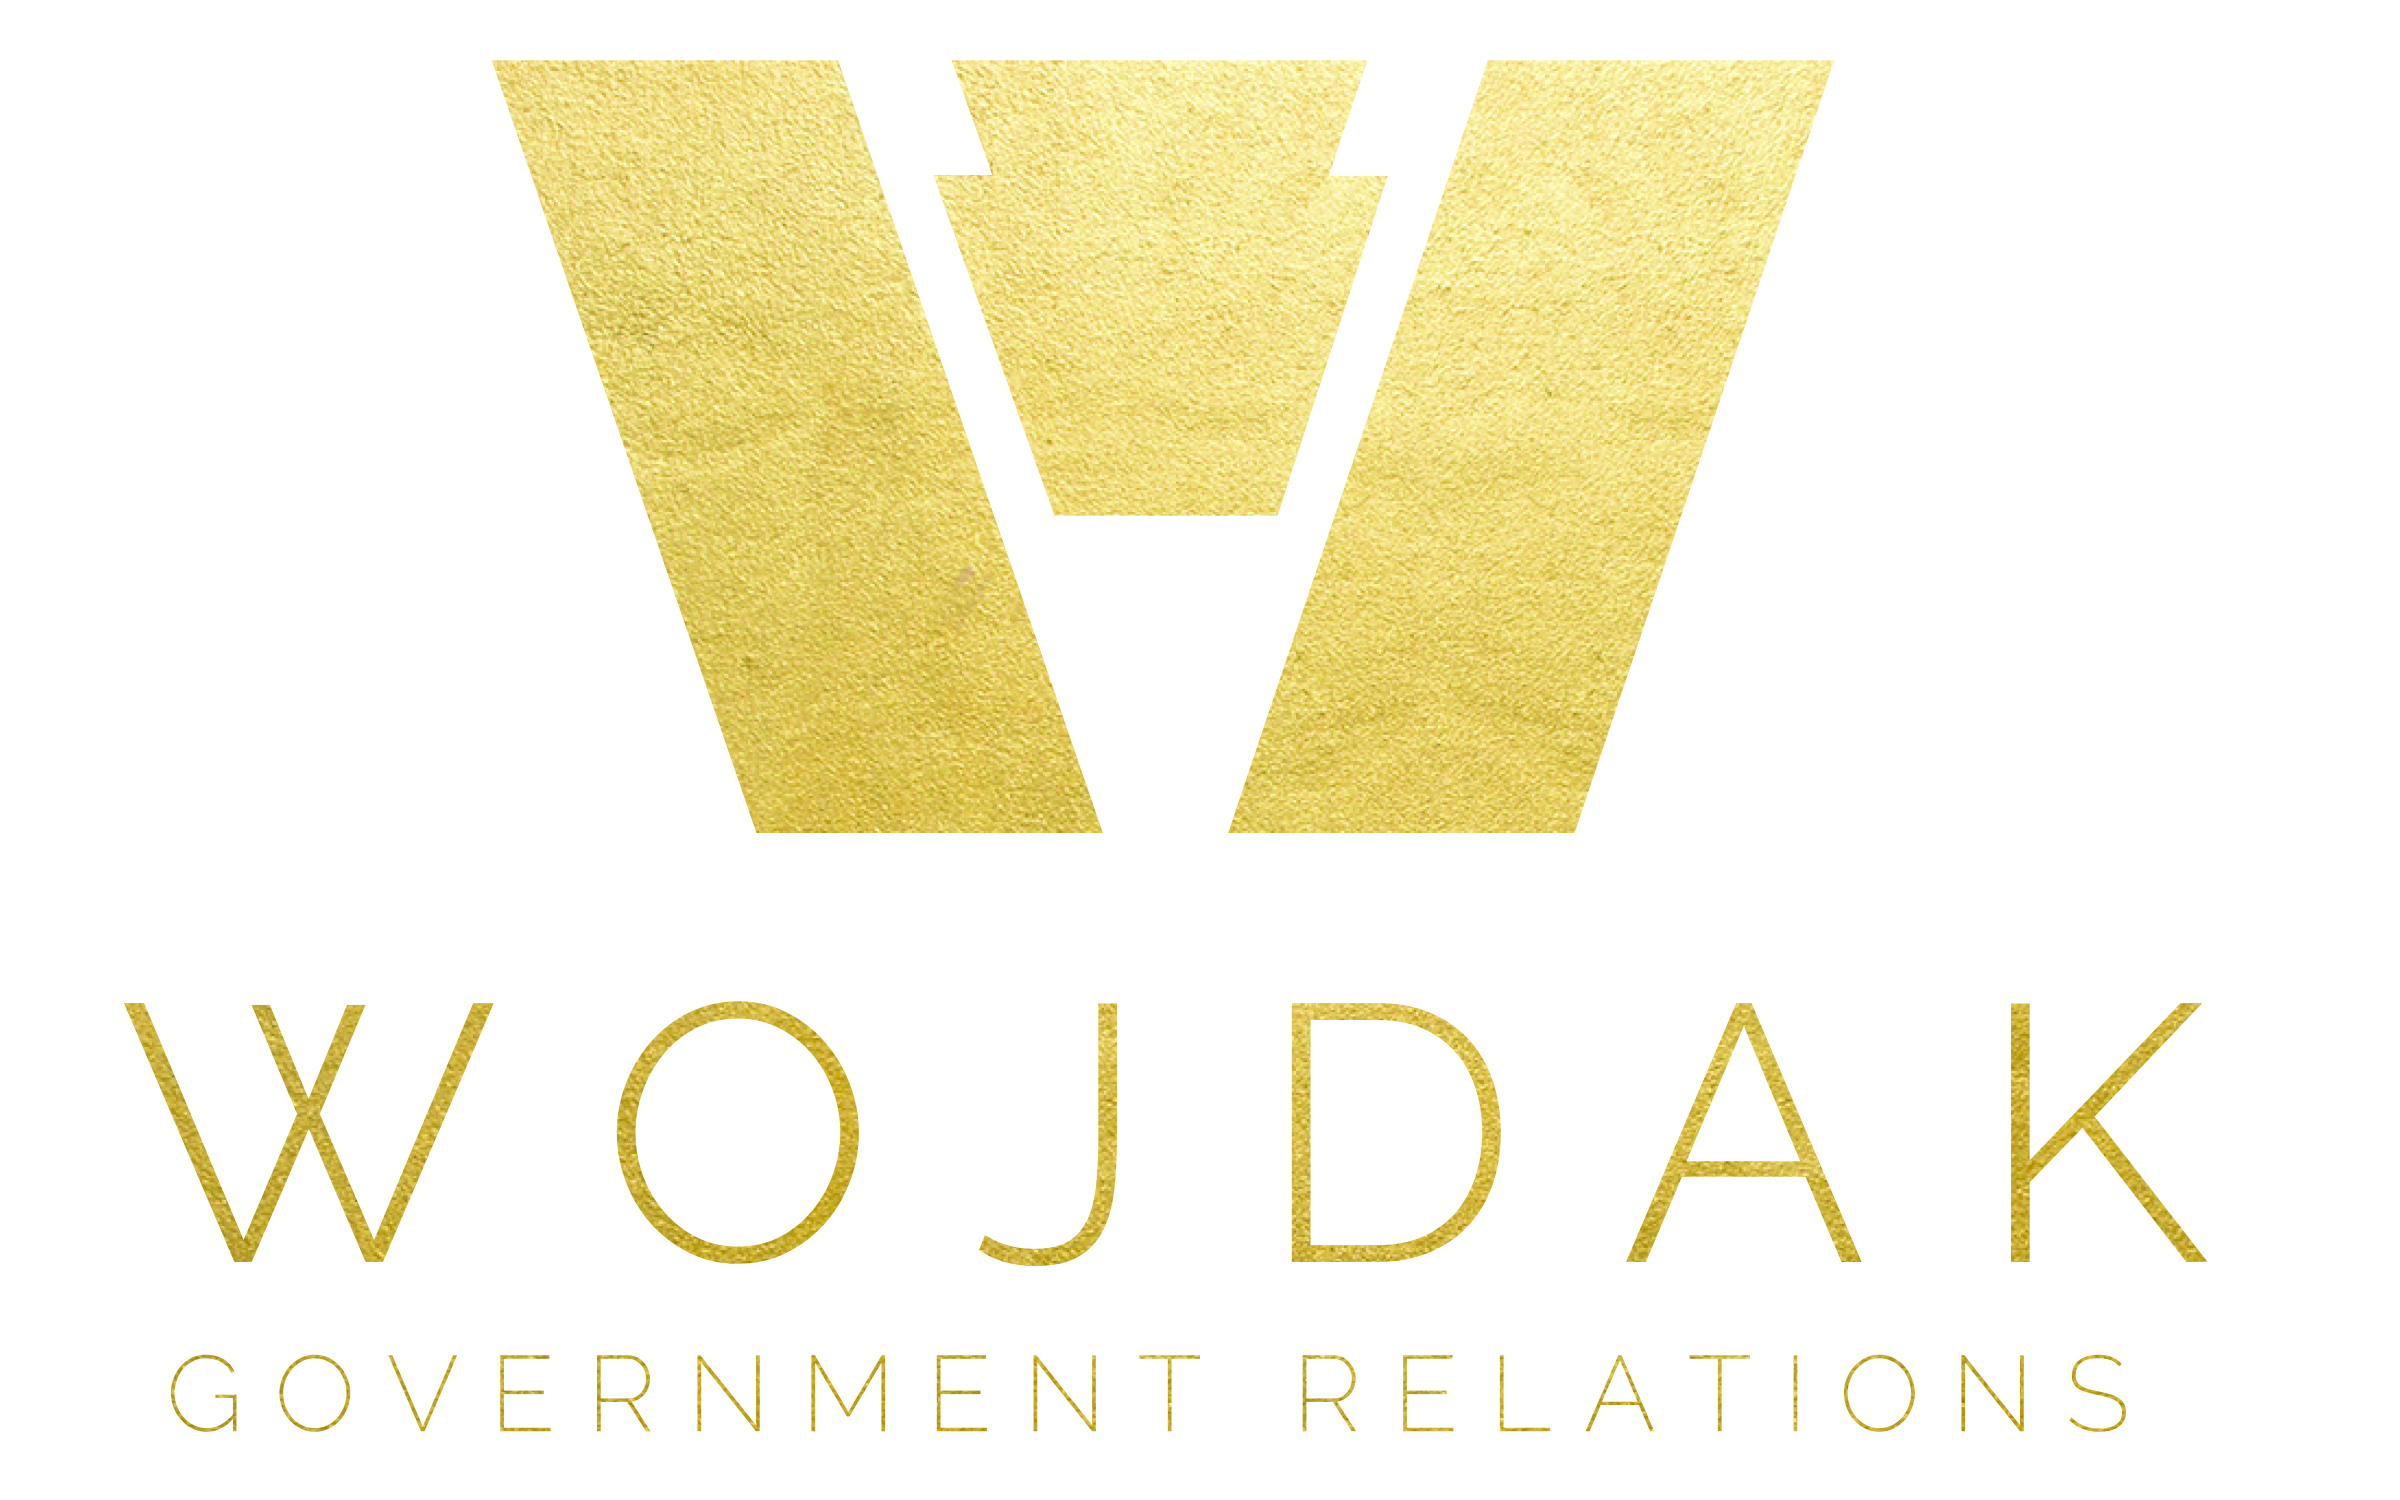 S.R. Wojdak & Associates